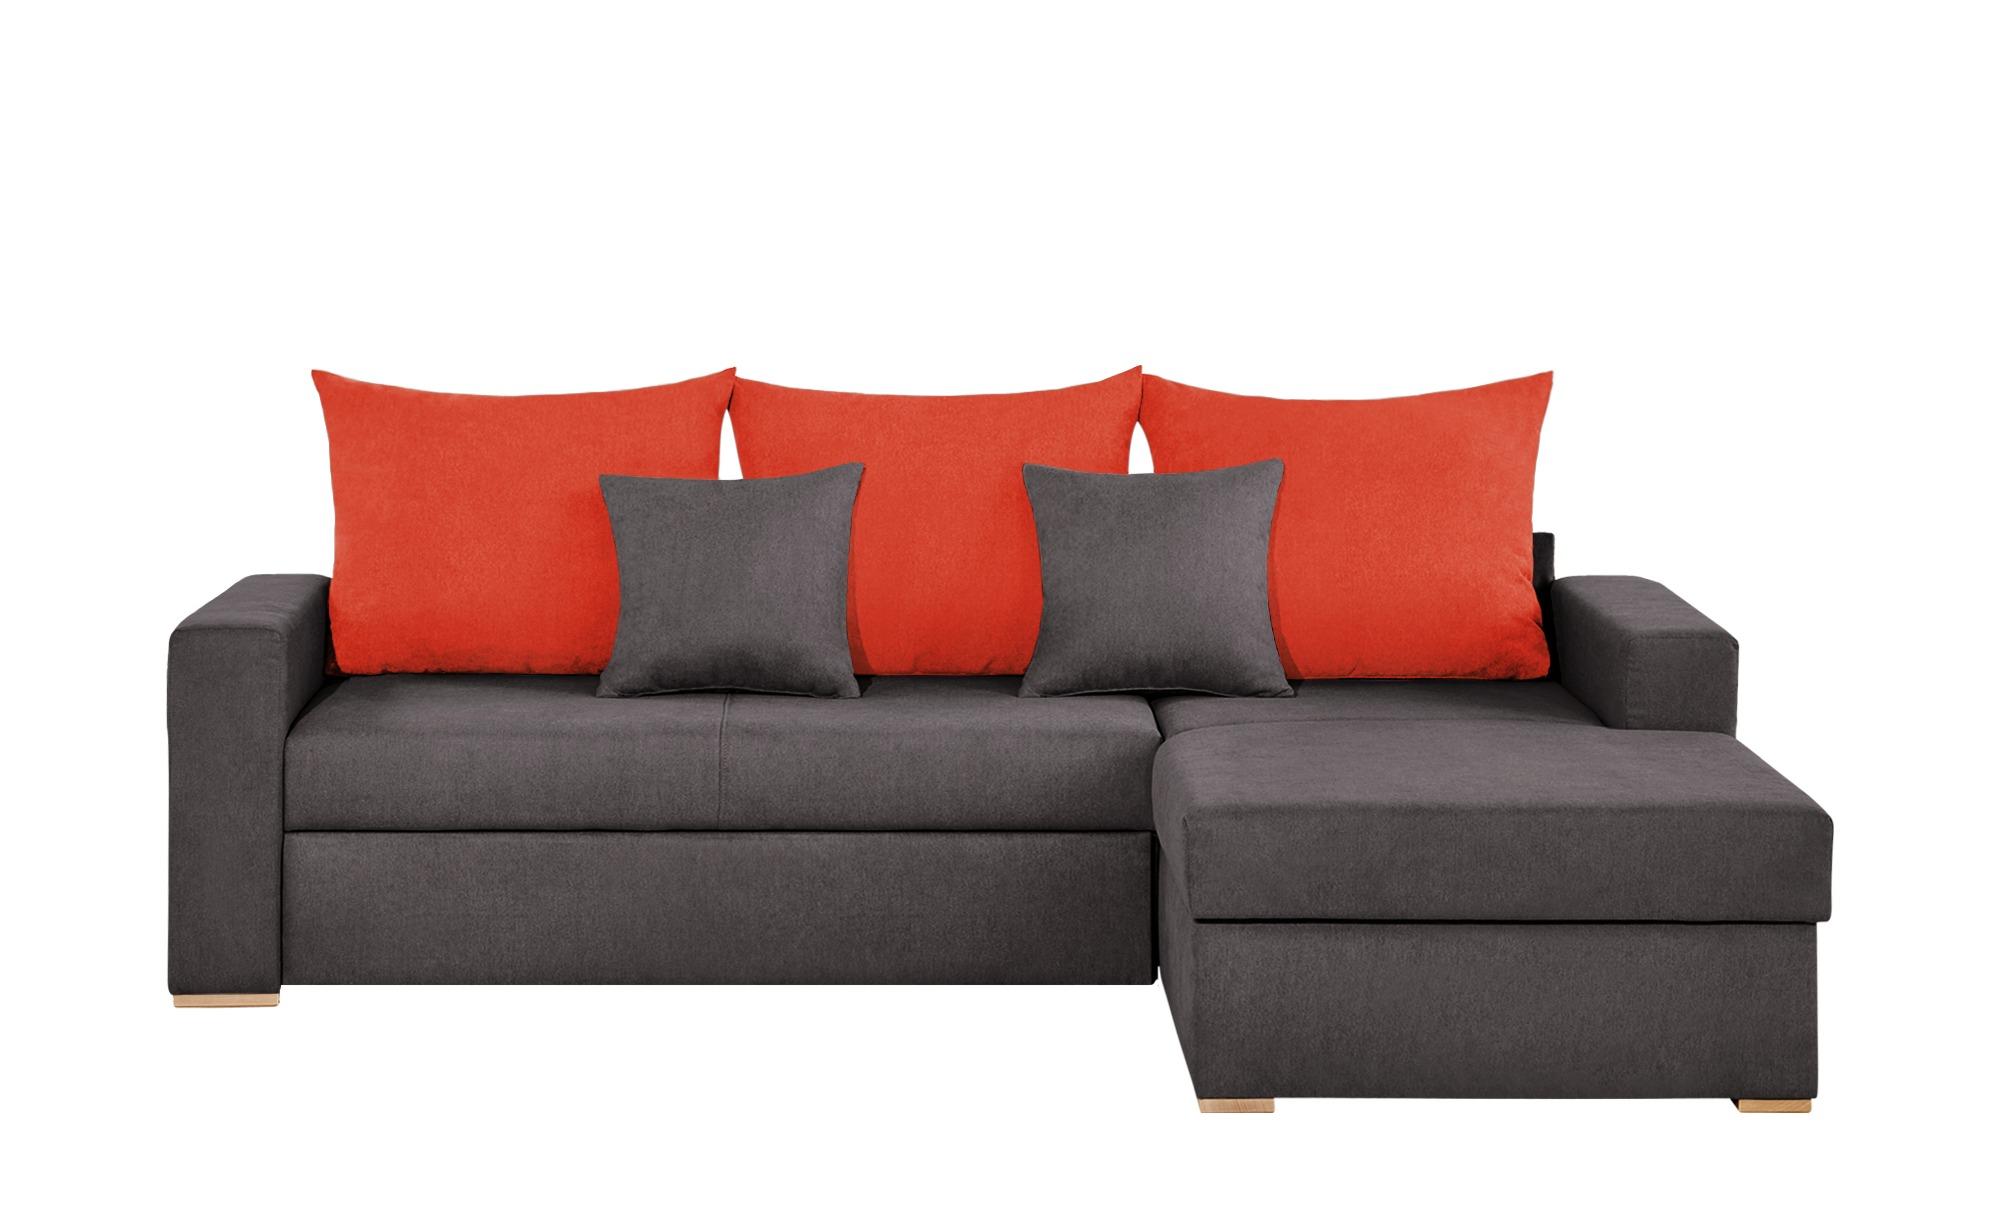 Smart ecksofa anna breite h he 65 cm orange online for Ecksofa kinderzimmer